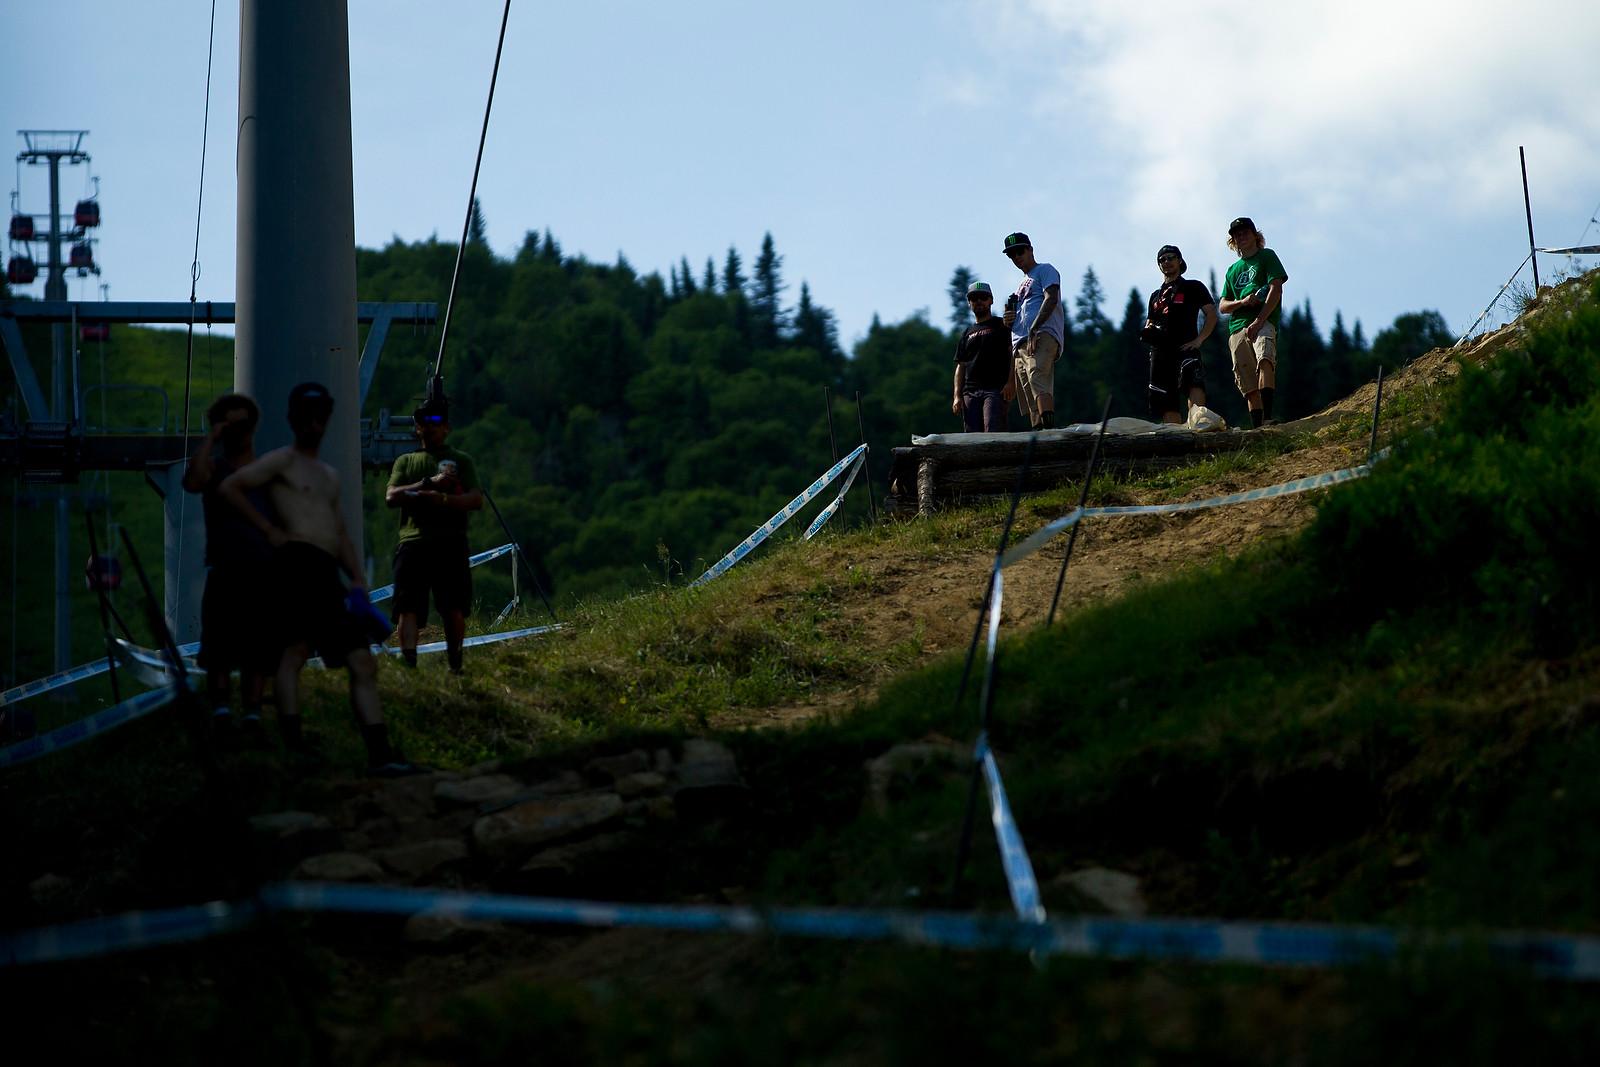 Sam Hill at Mont Sainte Anne - 2012 UCI World Cup, Mont Sainte Anne, Day 1 - Mountain Biking Pictures - Vital MTB